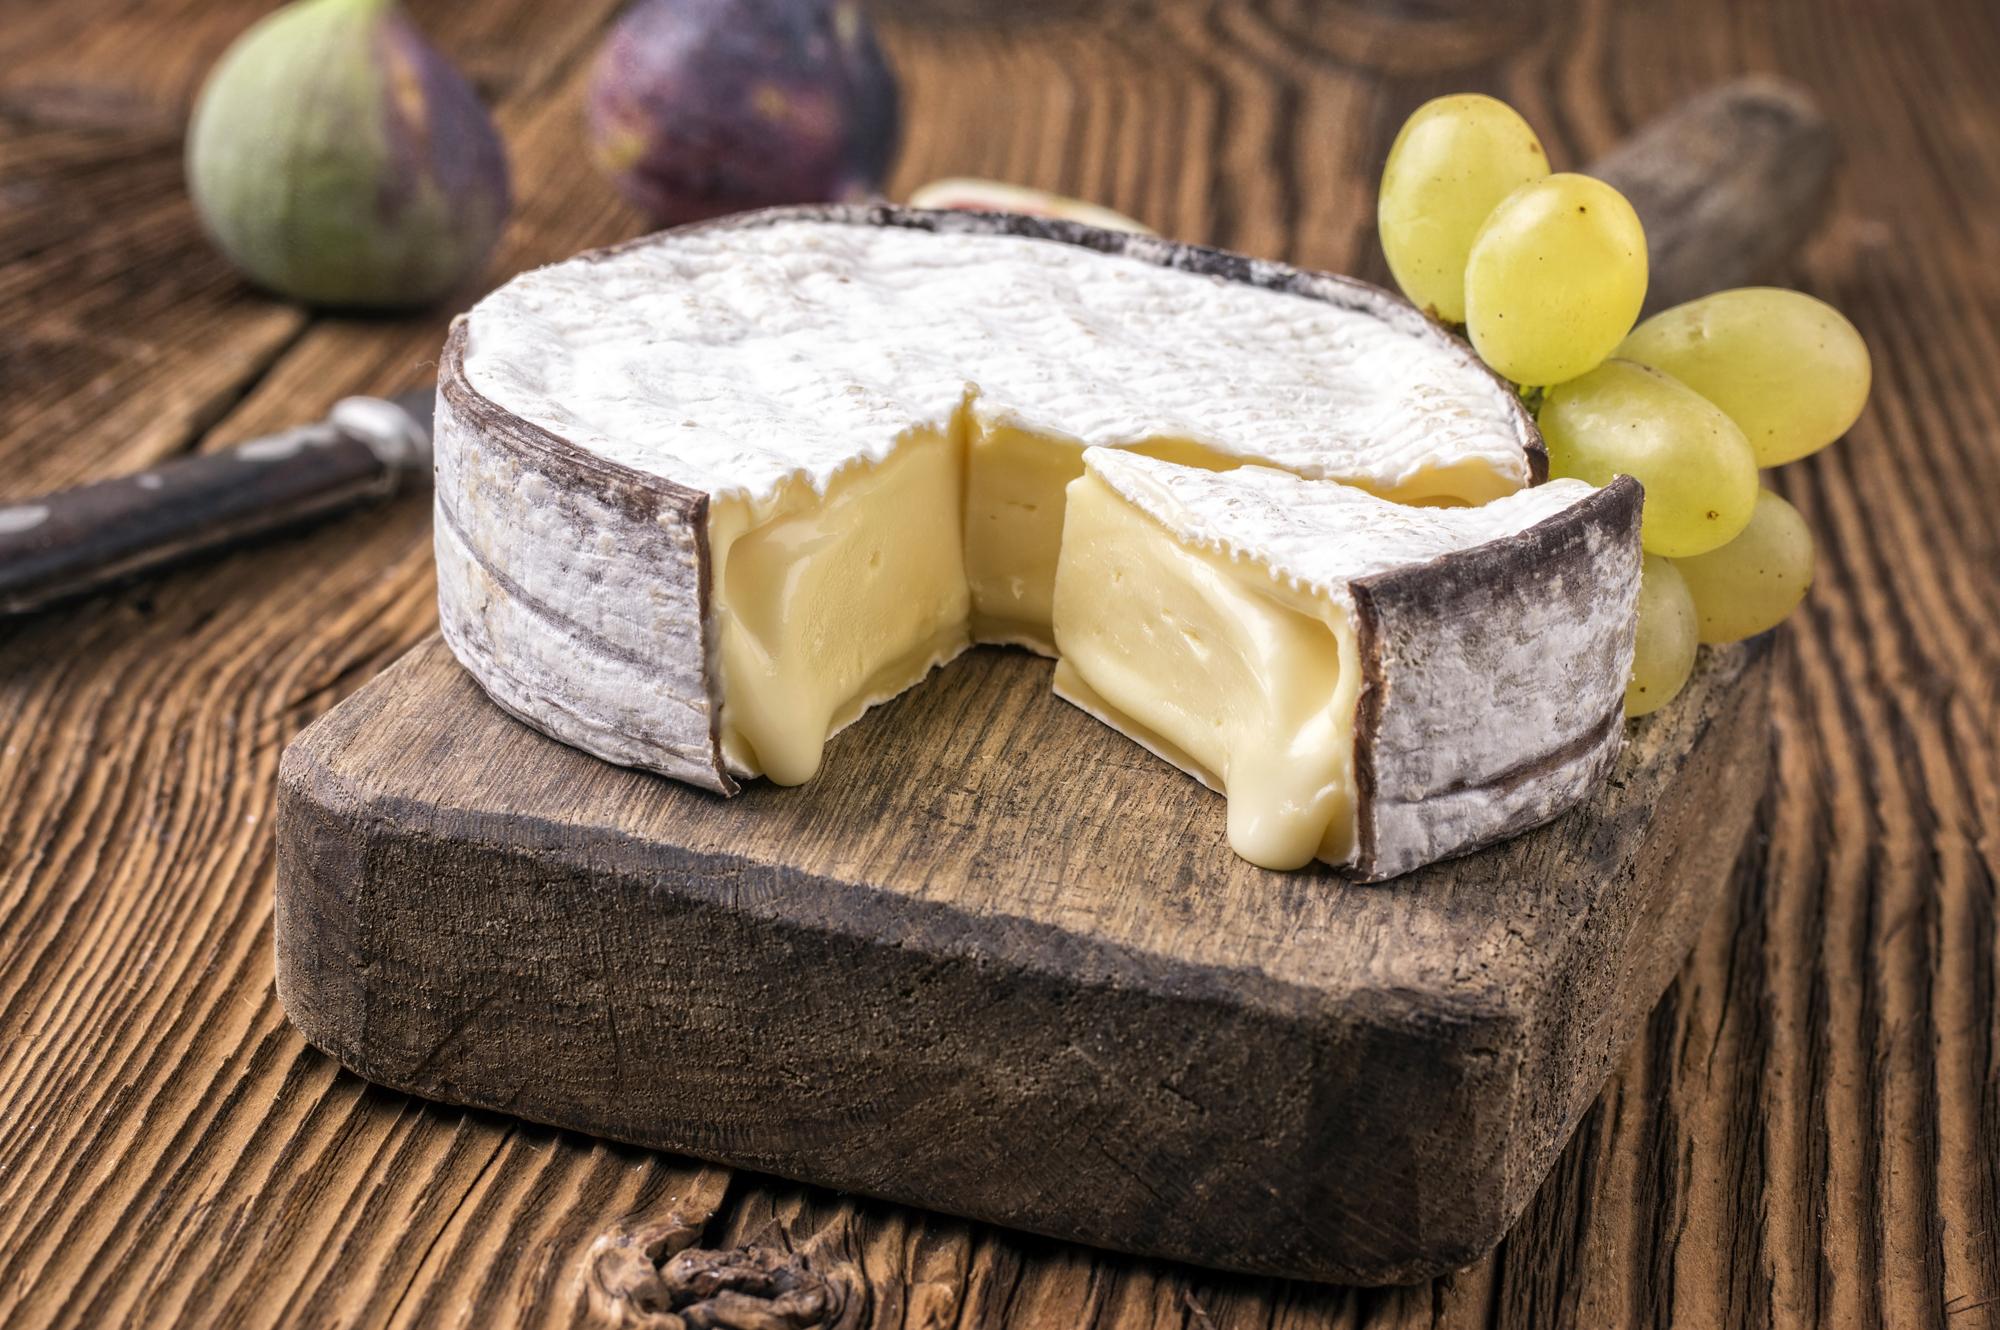 Prahran's Say Cheese Festival